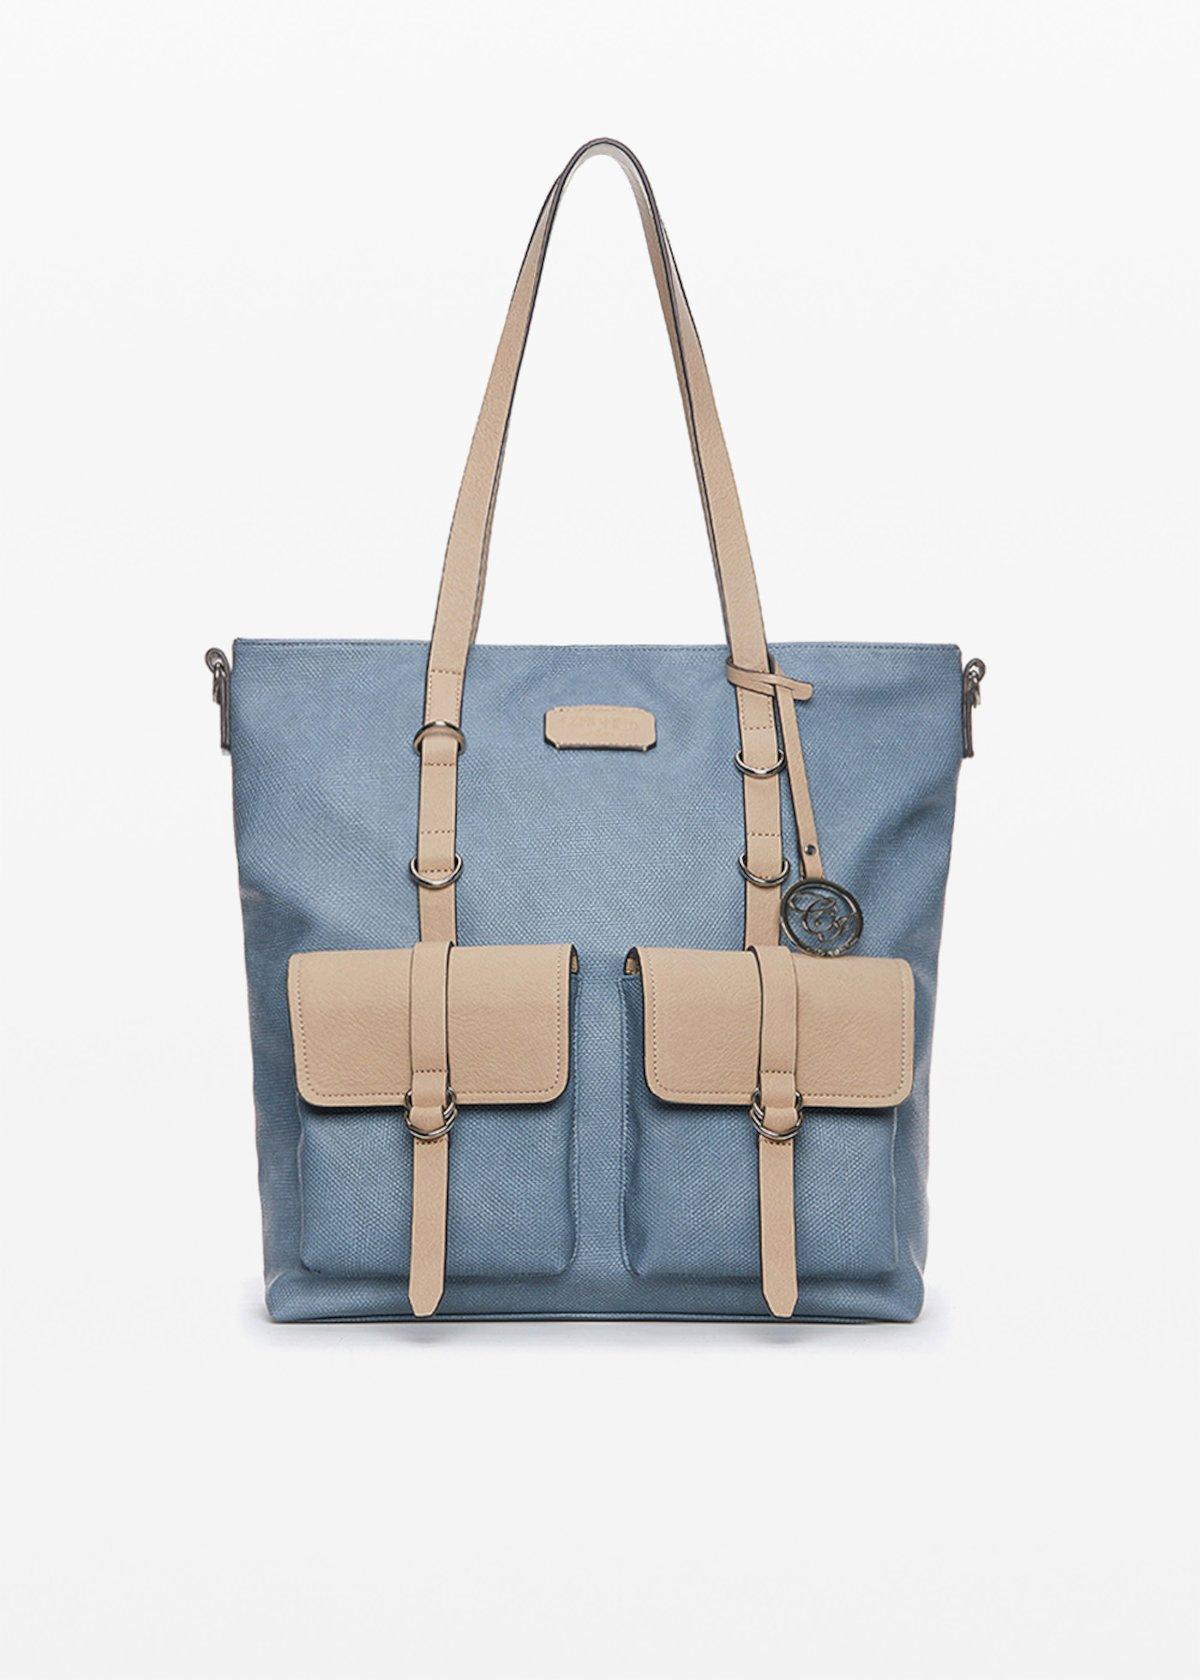 Handbag Bella bicolor in ecopelle con tasche - Shark / Doeskin - Donna - Immagine categoria